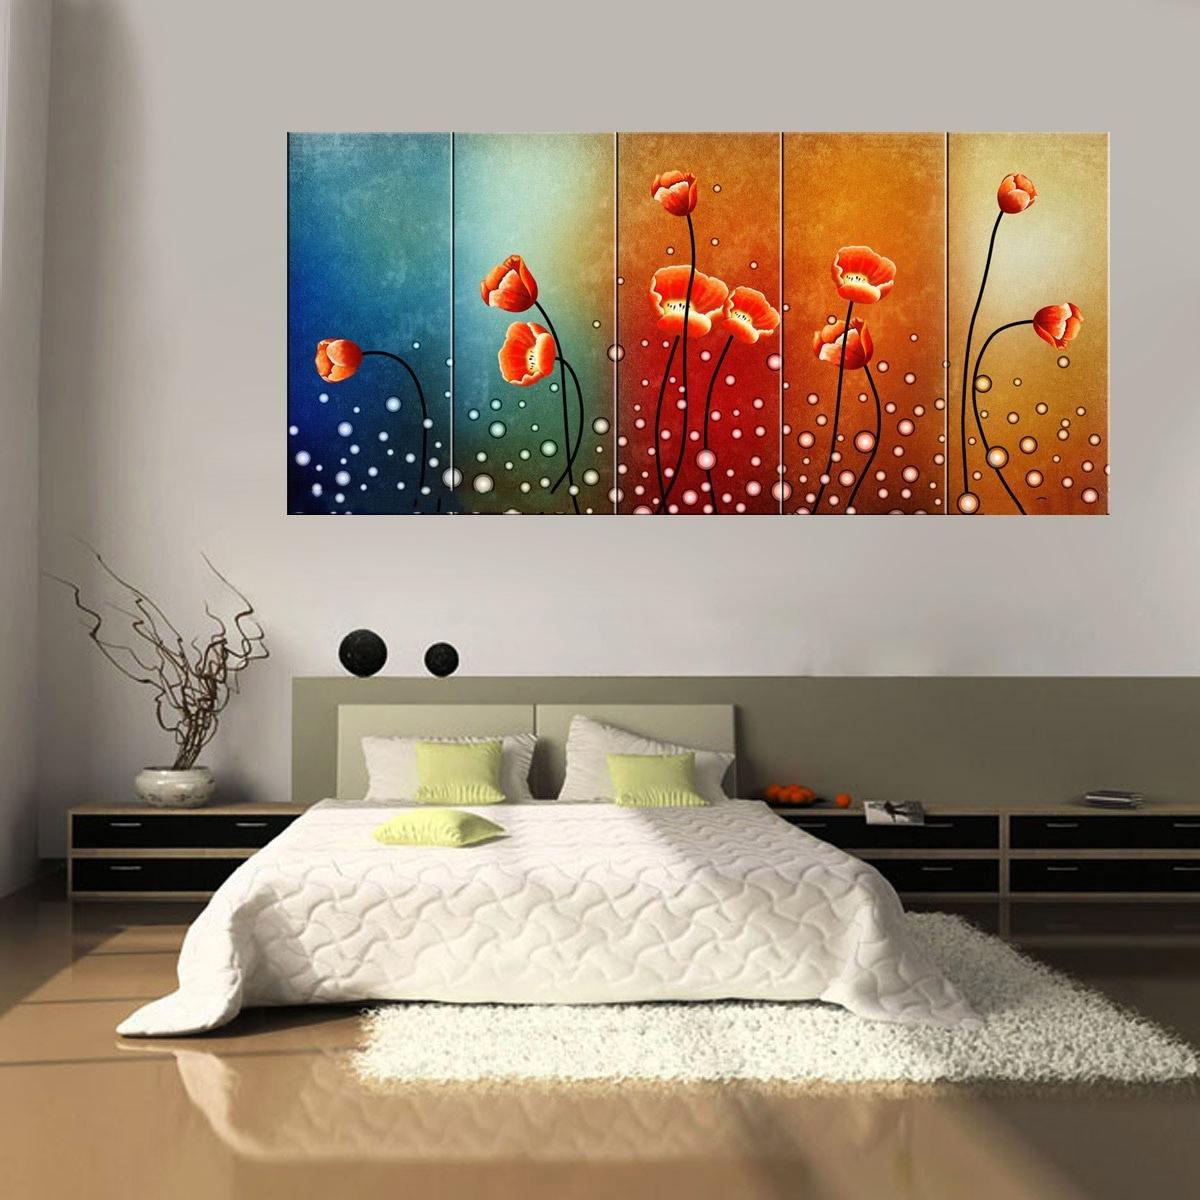 Impresión En Lienzo Nuevo Para Pared Decoración Para Hogar Sala Cocina Dormitorio Flores Coloridas Elegantes (sin marco o bastidor)